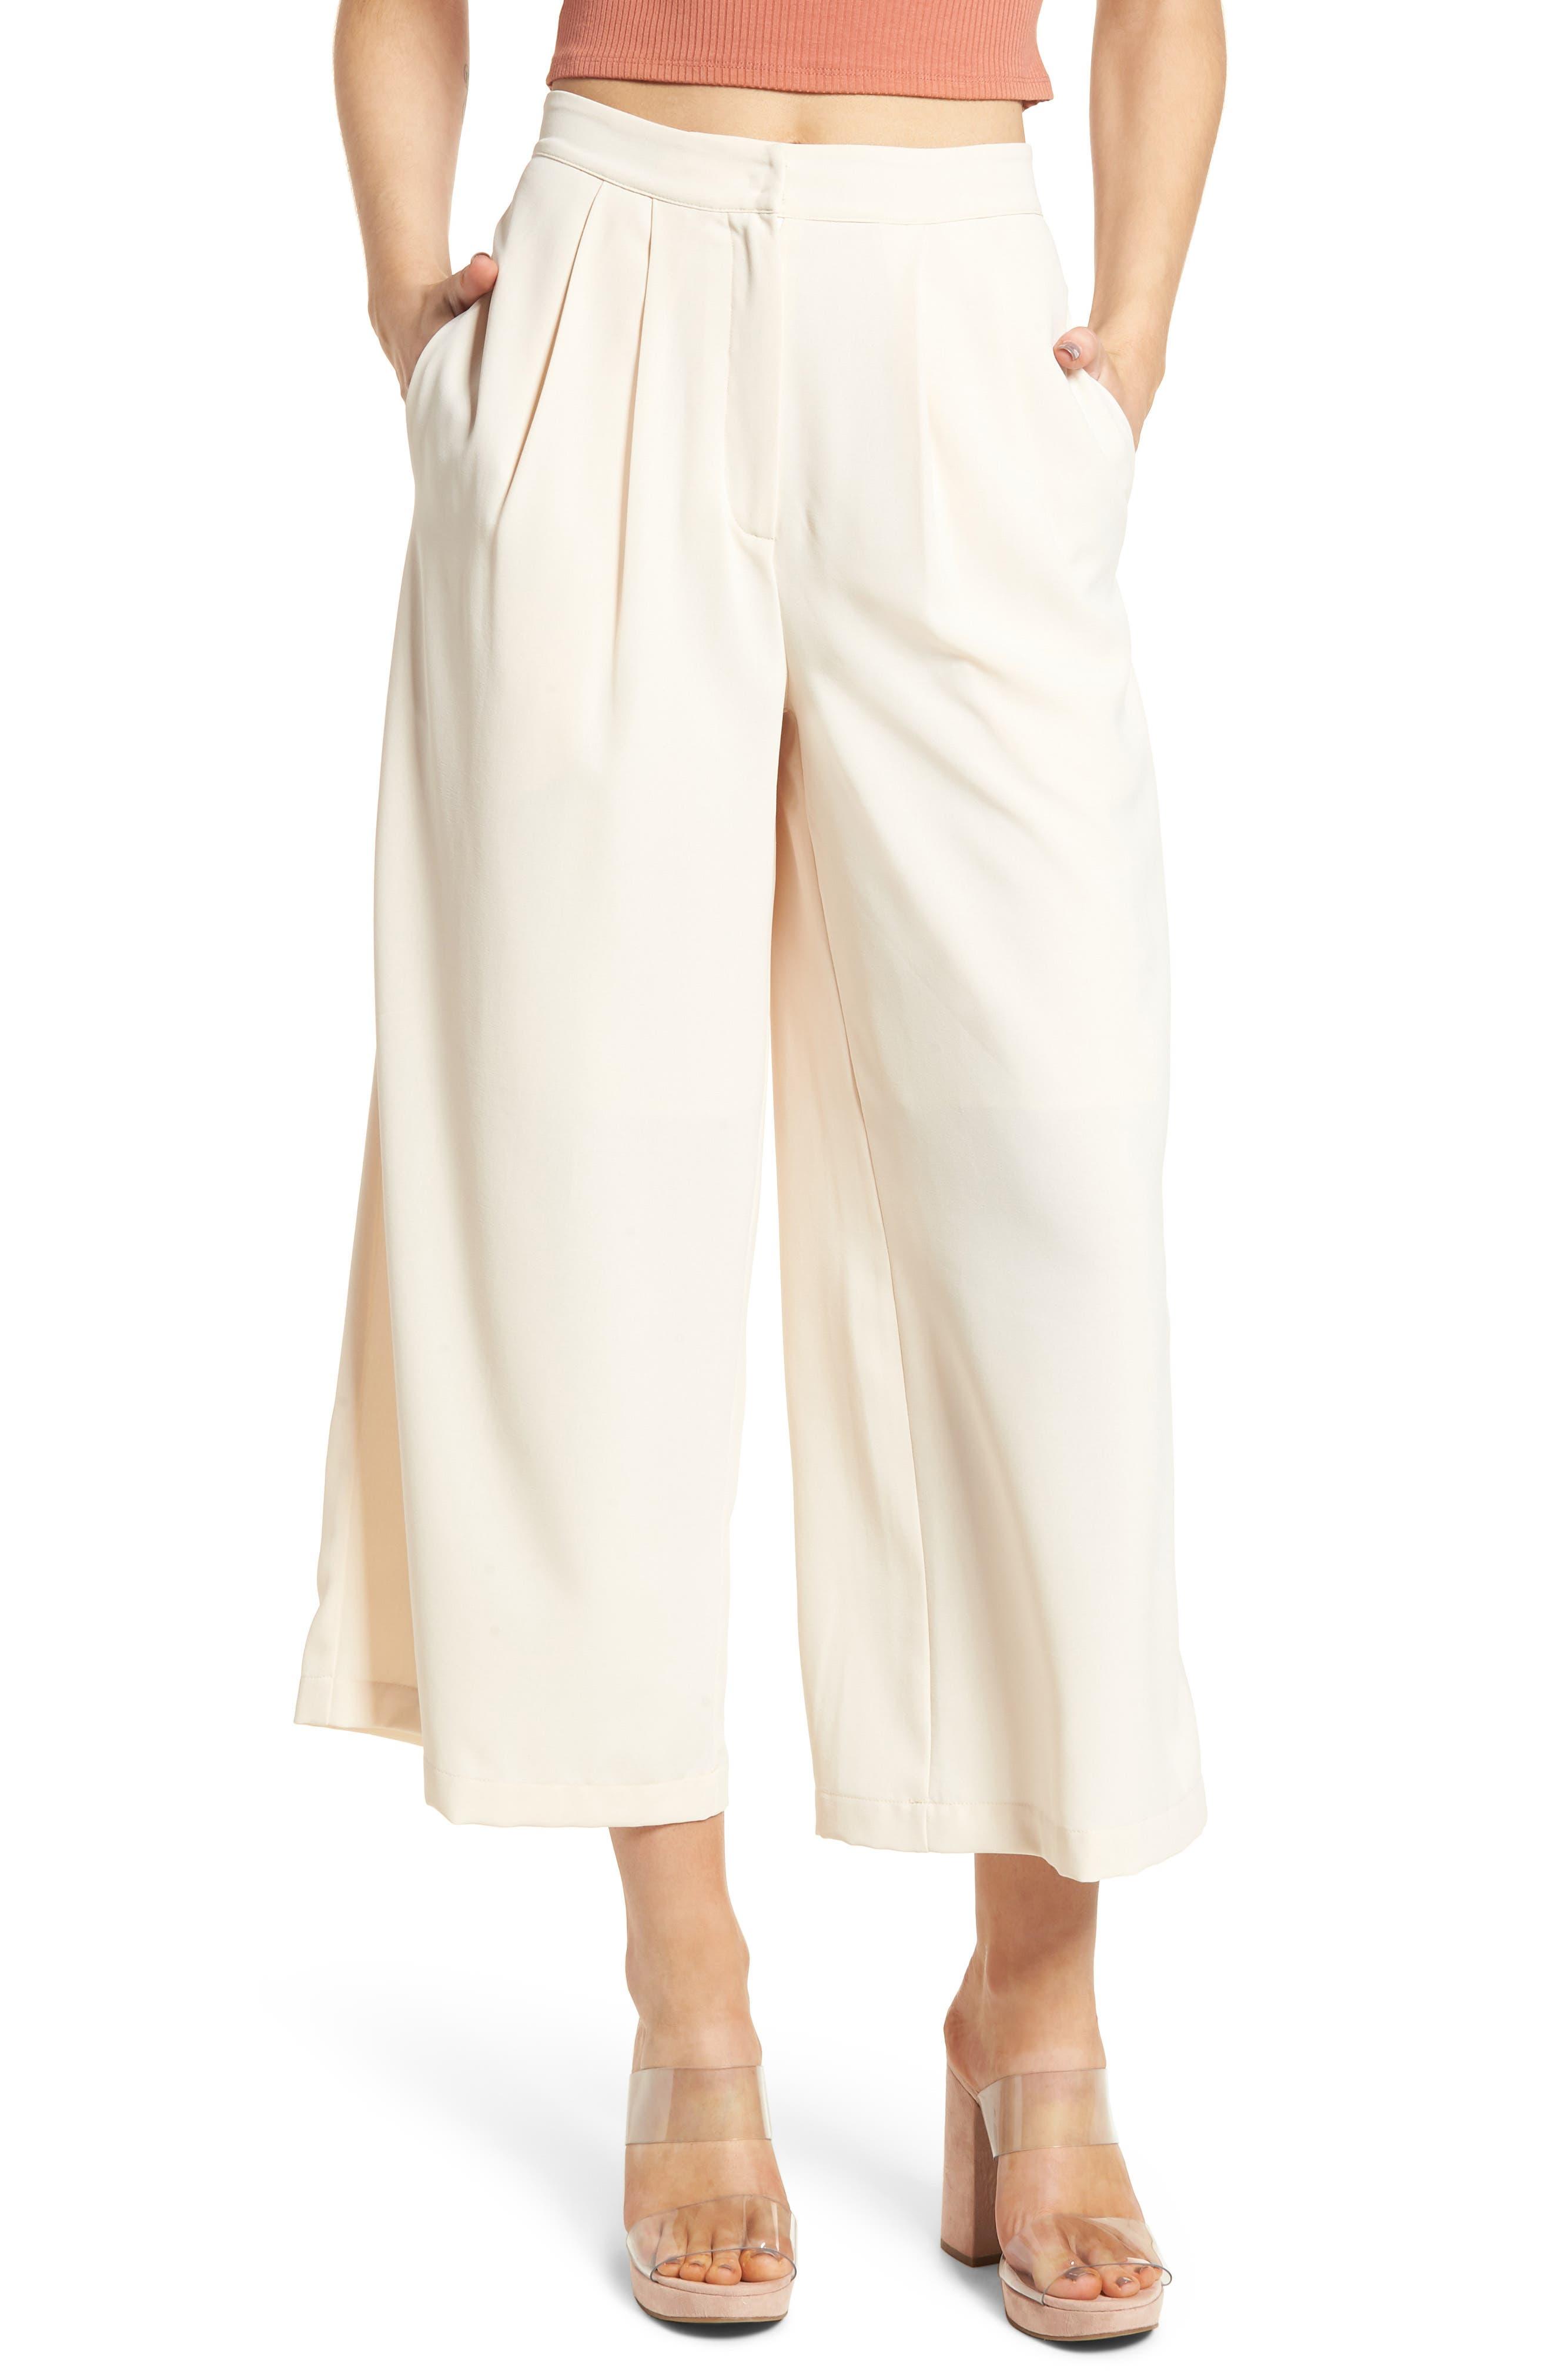 Alternate Image 1 Selected - Chriselle x J.O.A. Pleat High Waist Crop Wide Leg Pants